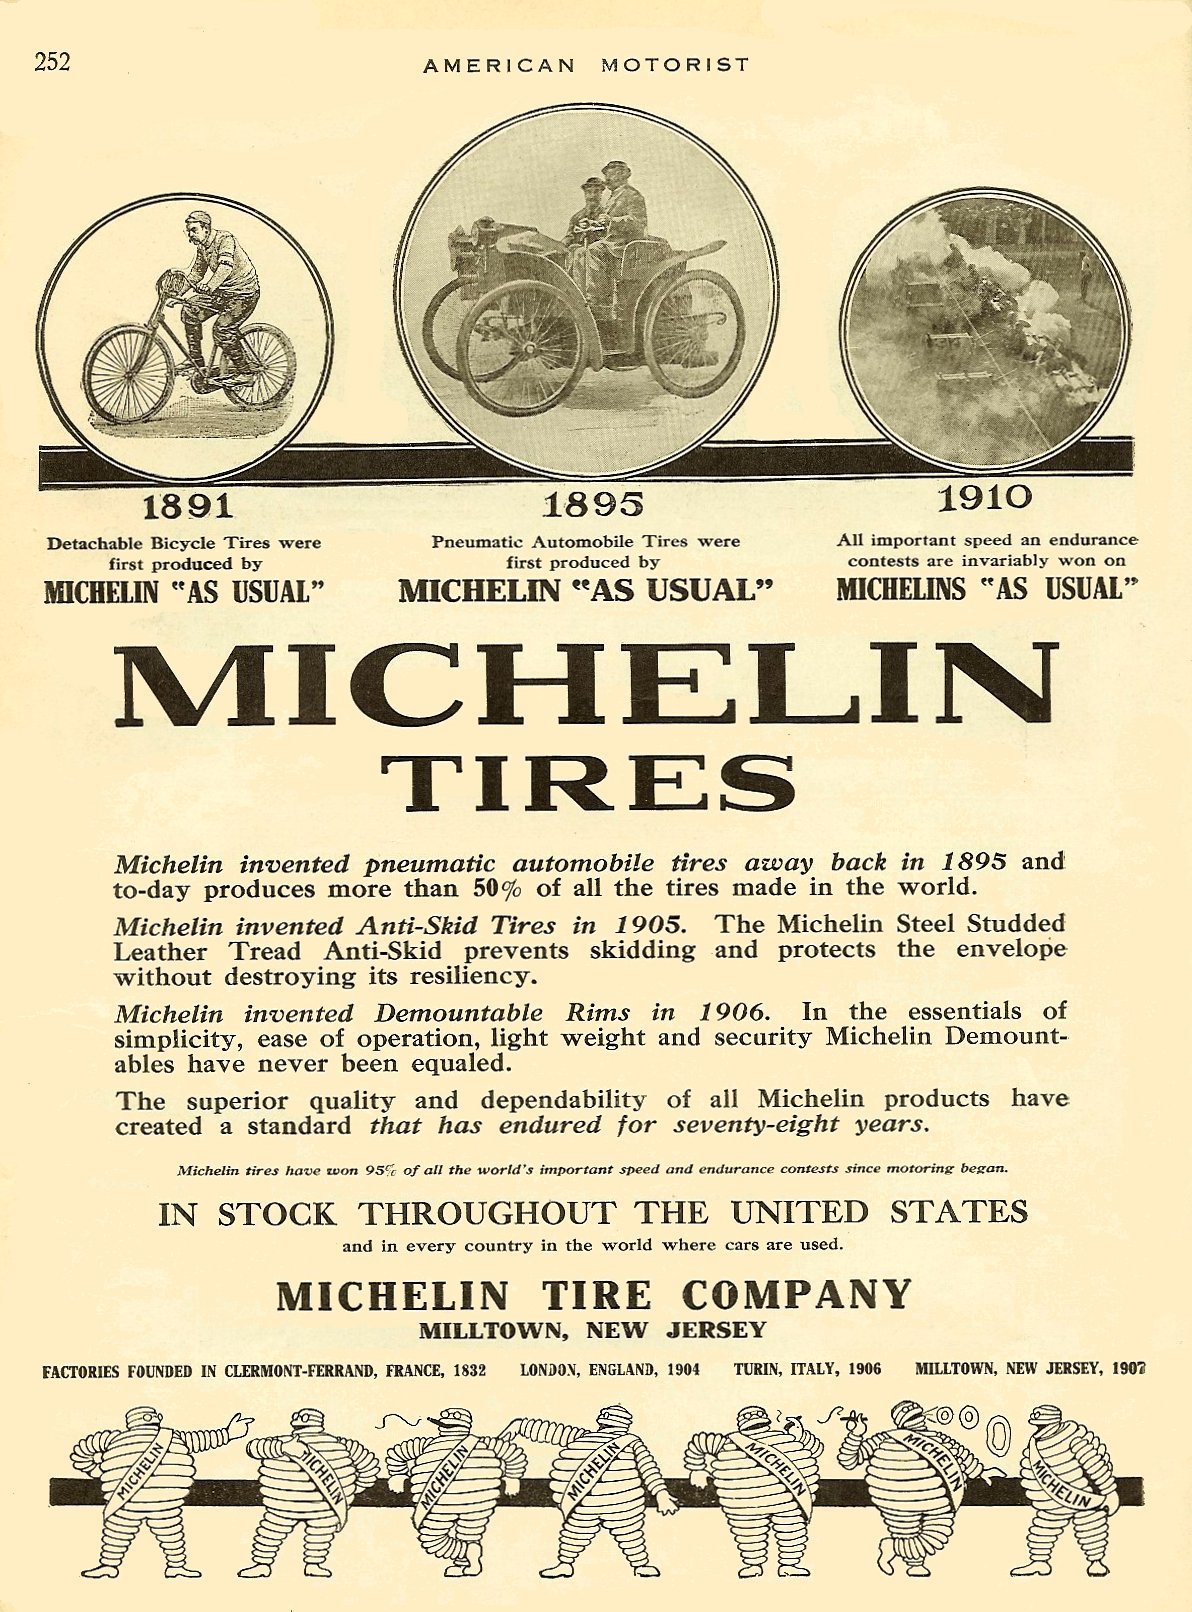 1910 7 MICHELIN Tires AMERICAN MOTORIST July 1910 Vol. 2 No. 2 9″x11.75″ page 252